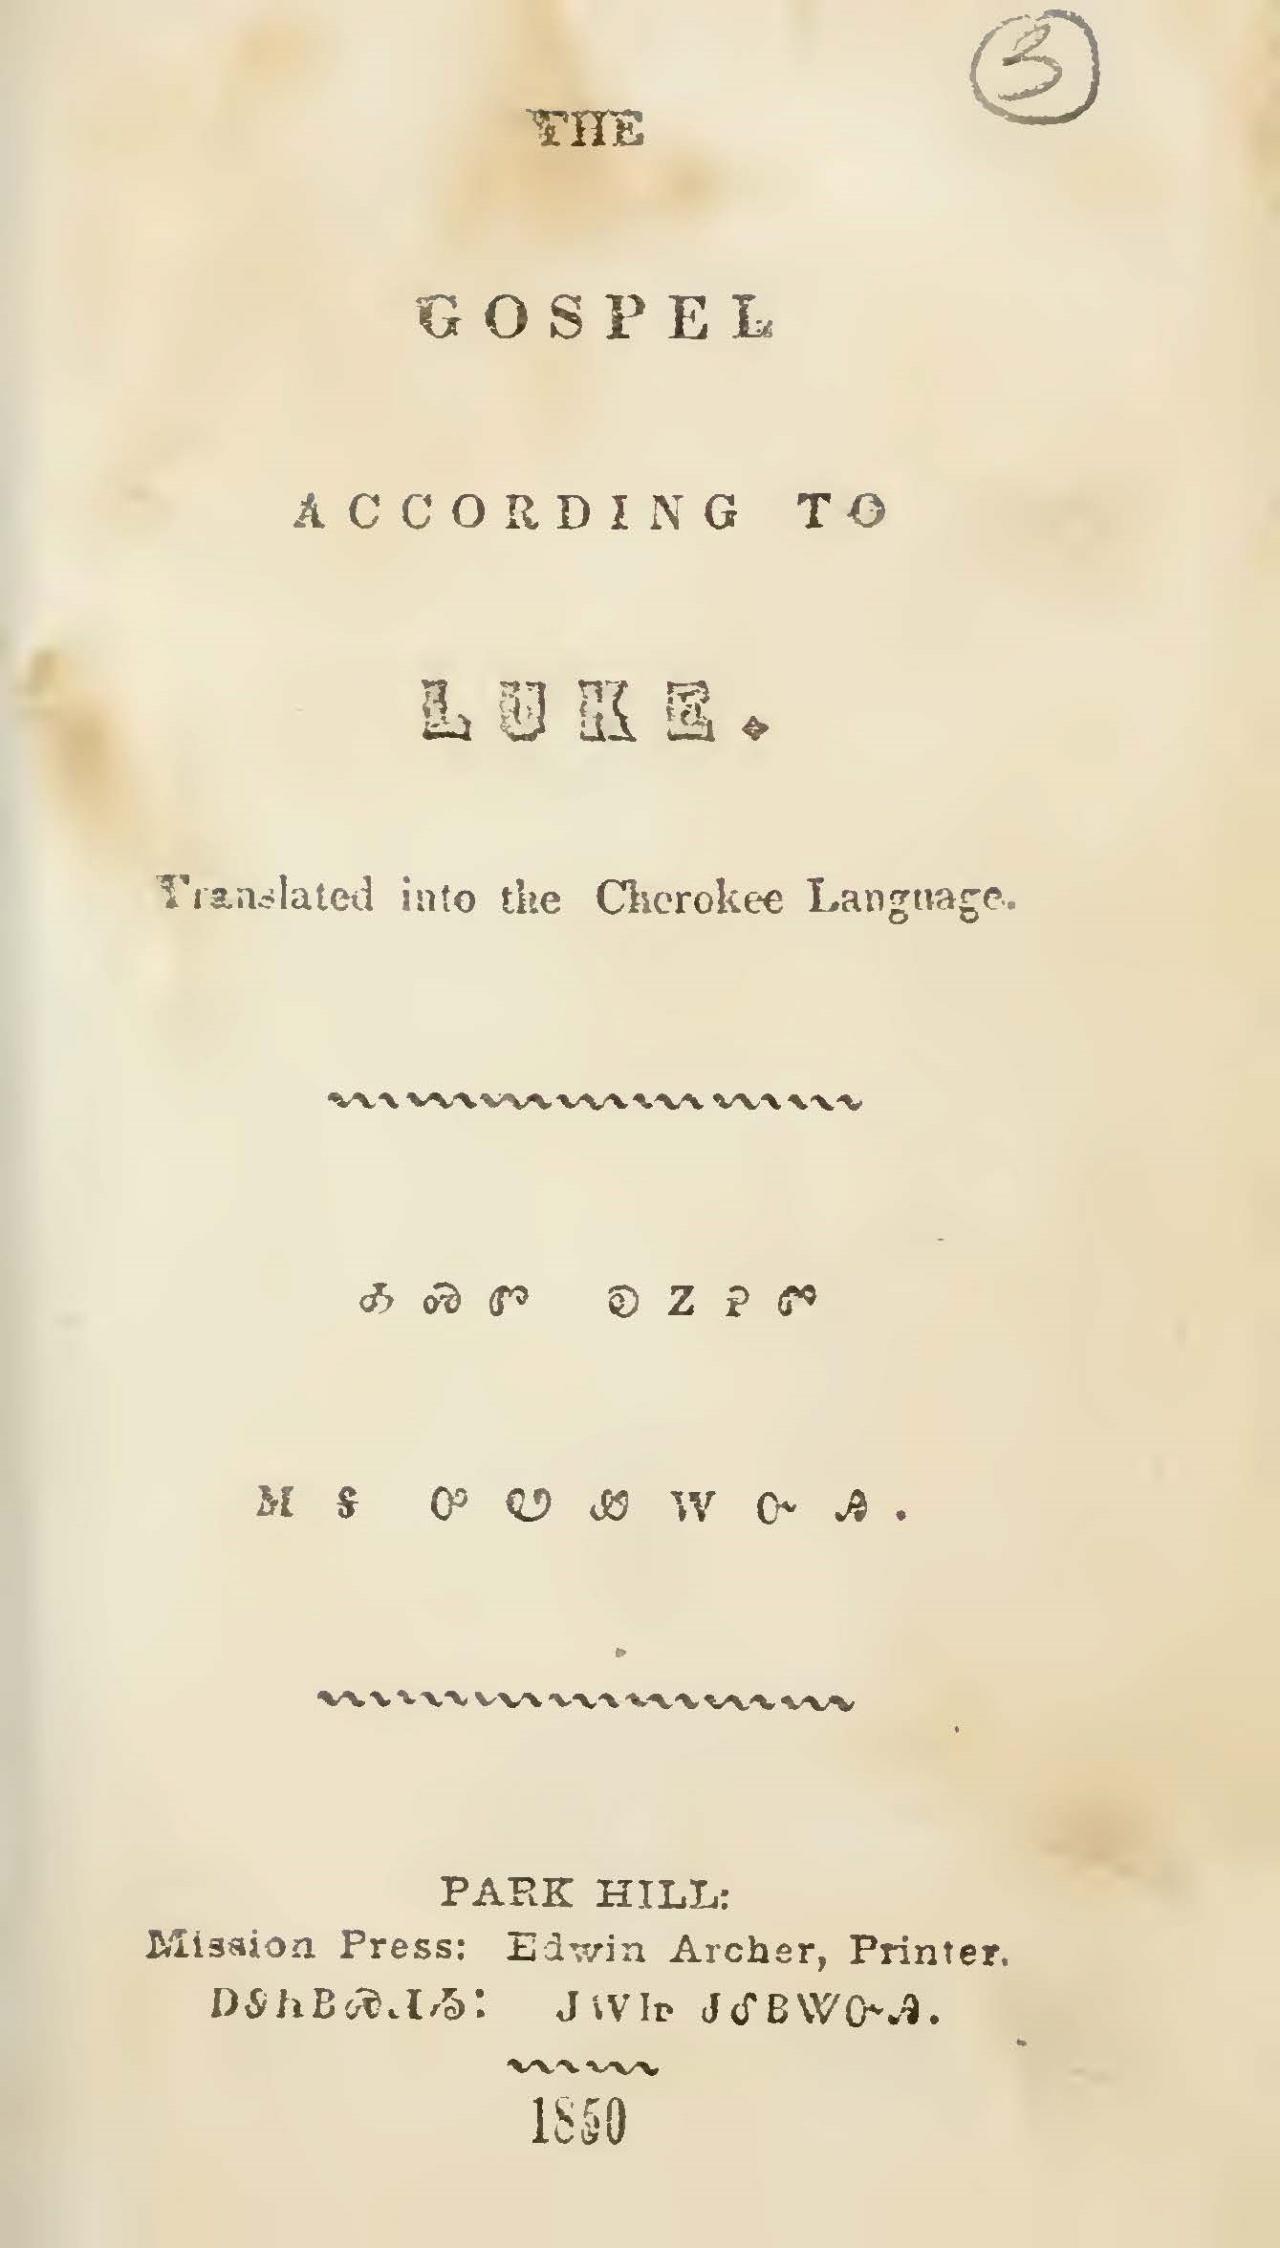 Foreman, Stephen, The Gospel According to Luke Title Page.jpg